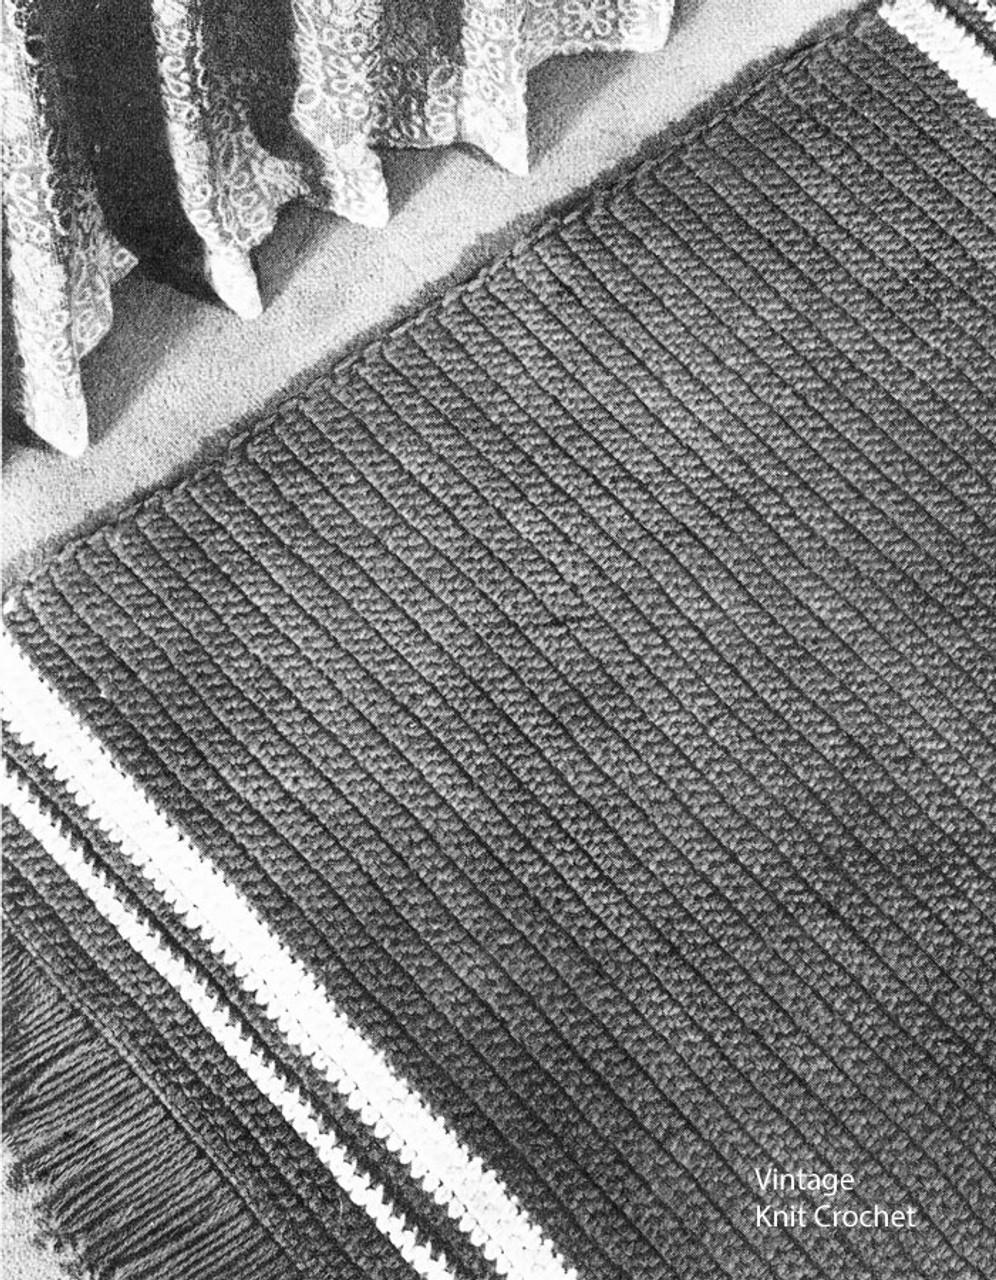 Crochet Bedroom Rug Pattern, Vintage 1940s